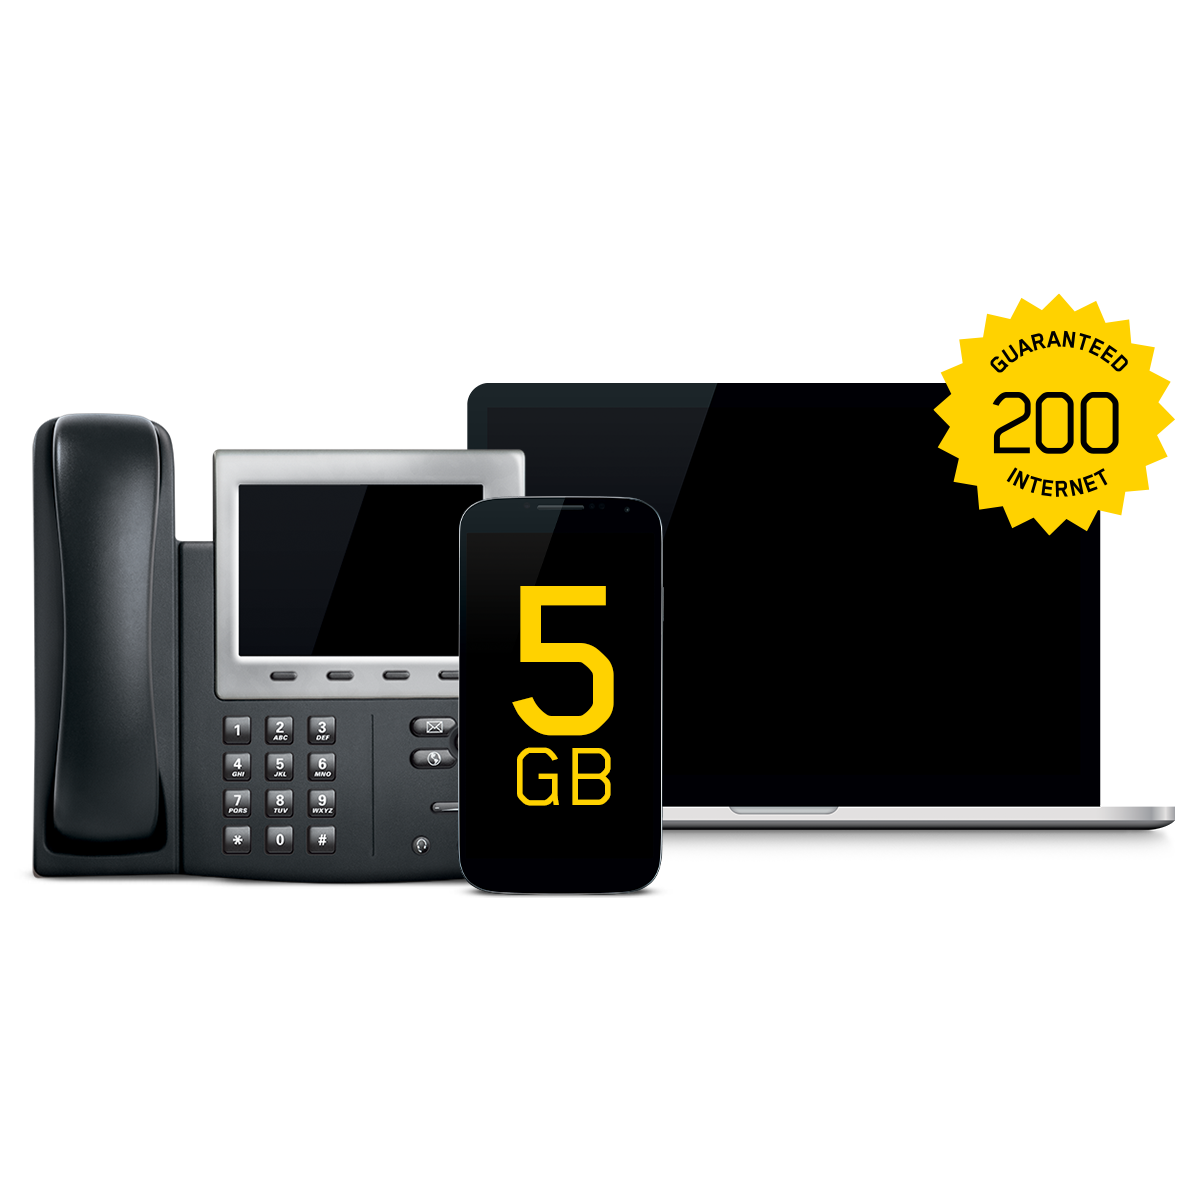 GUARANTEED 200 INTERNET + 5 GB MOBILE + OPTIMIZED BUSINESS LINE